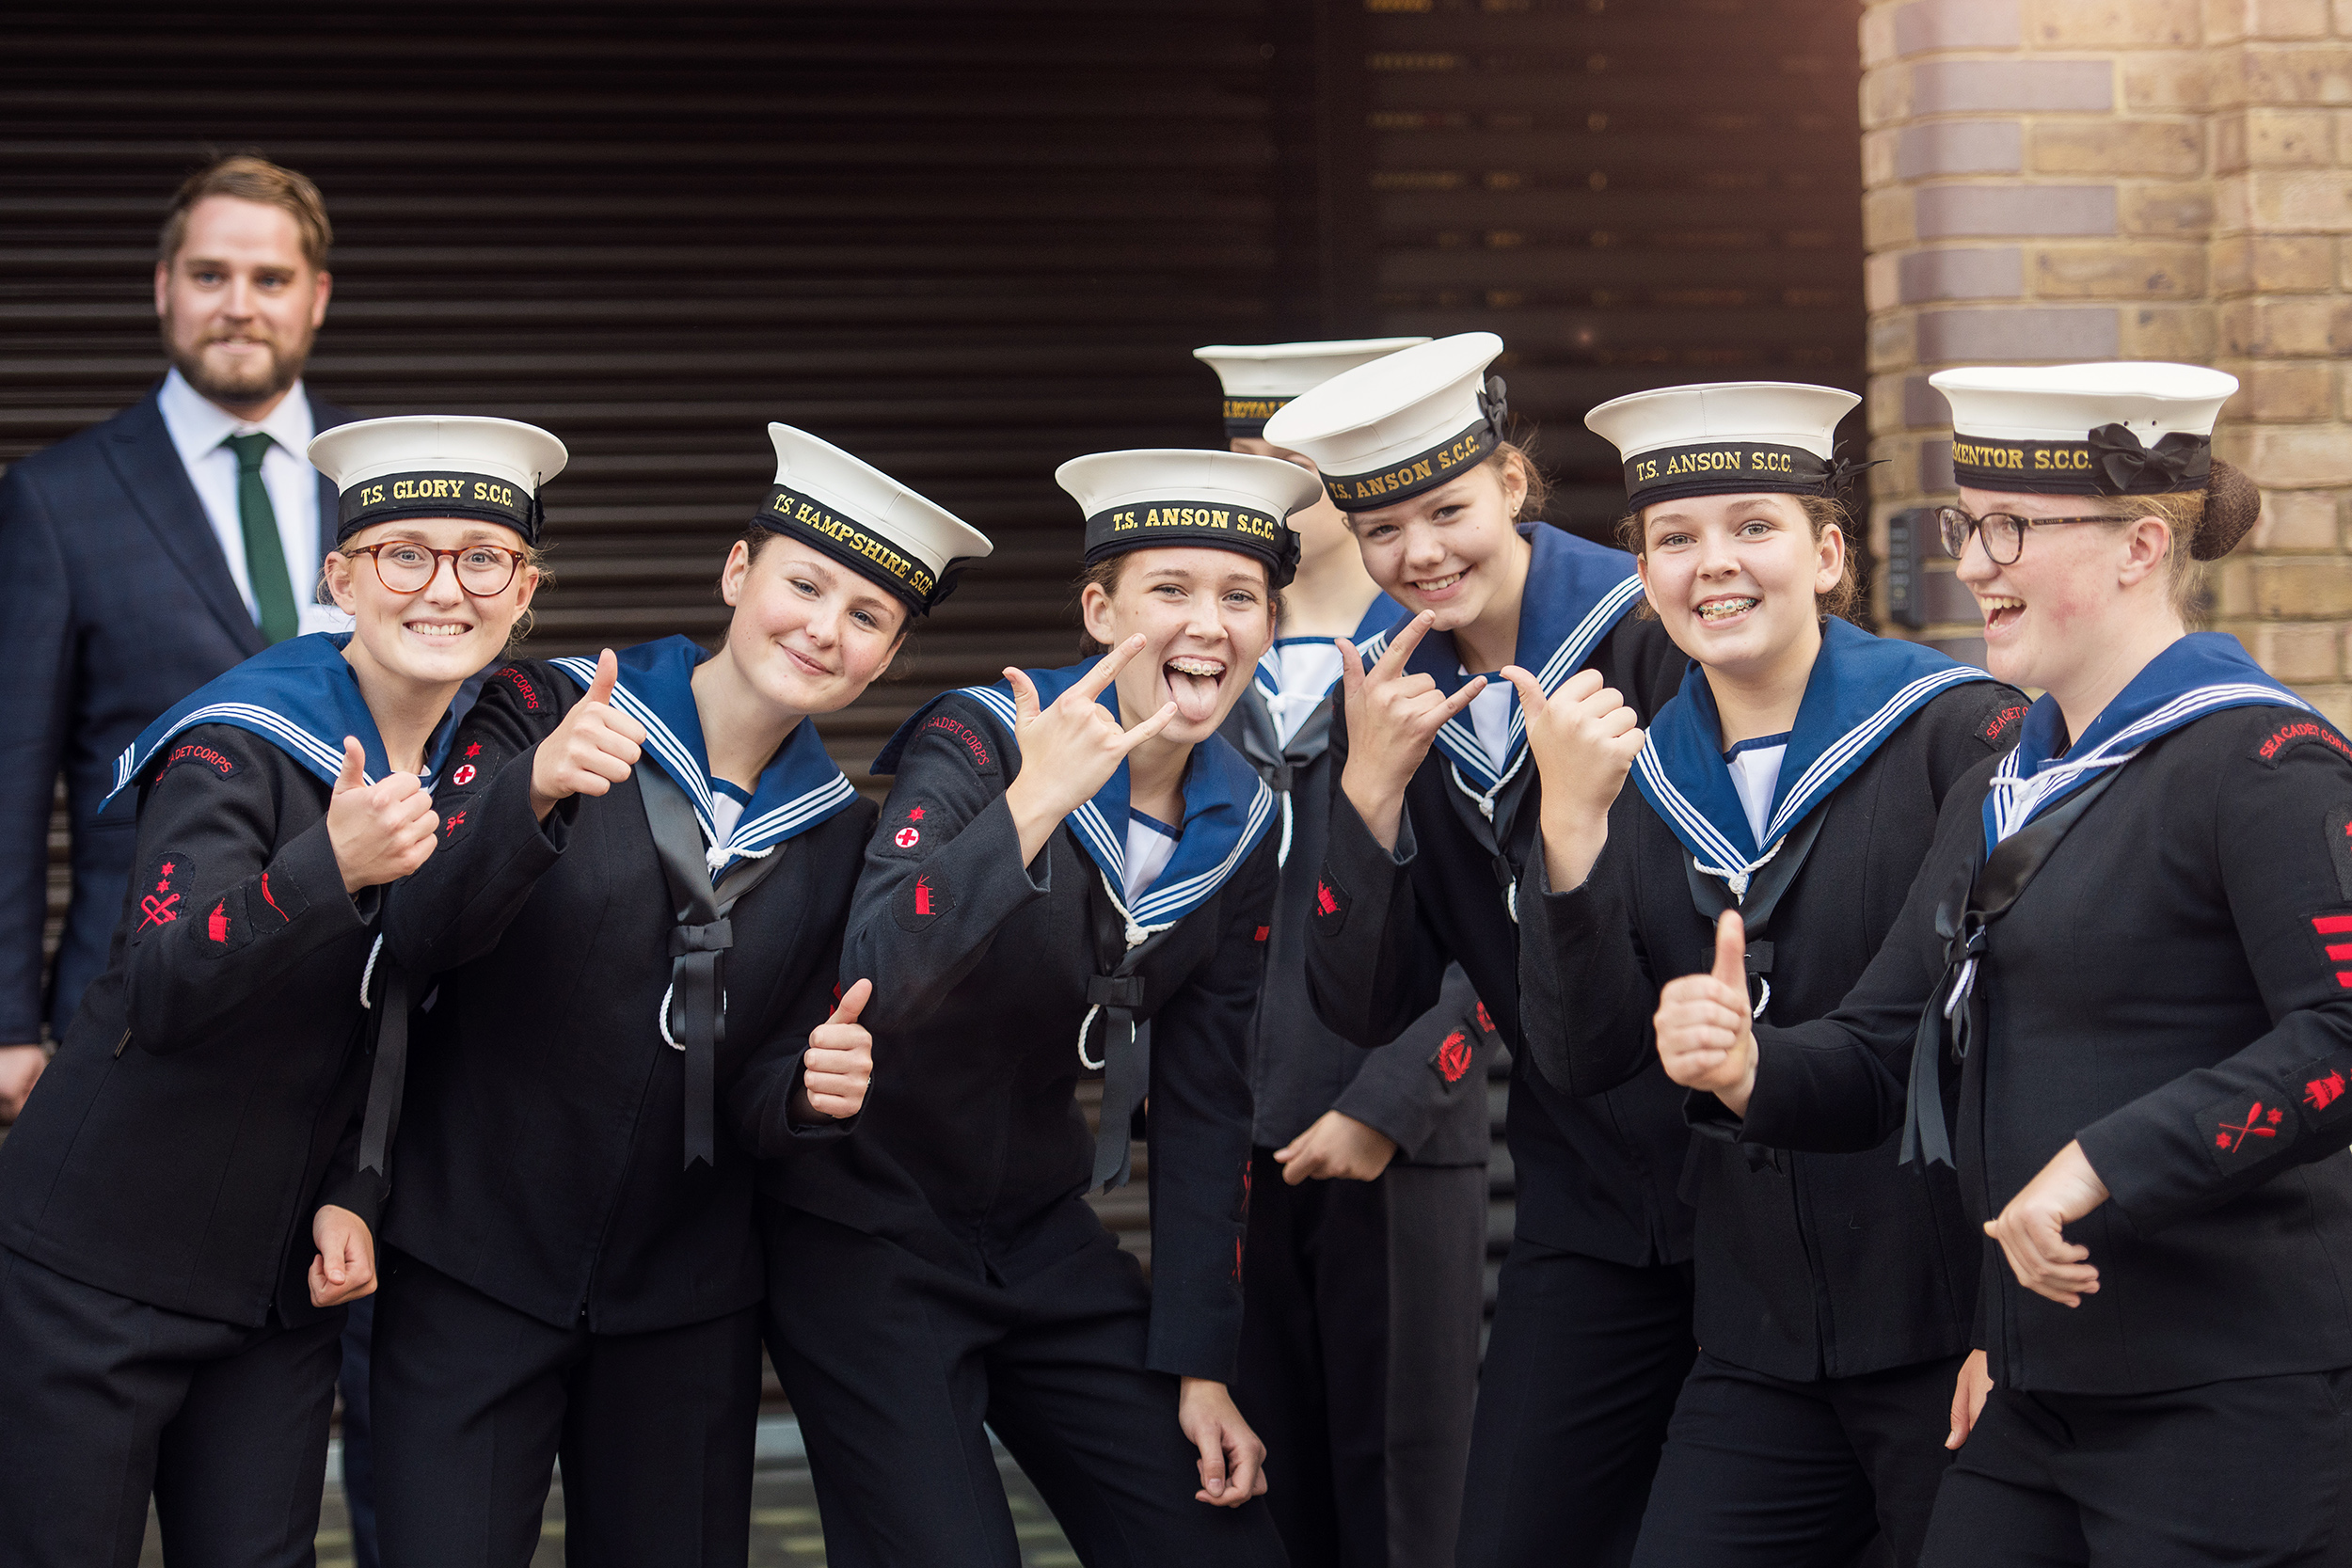 sea+cadets+ts+stellios+2018+quick+edit-3.jpg